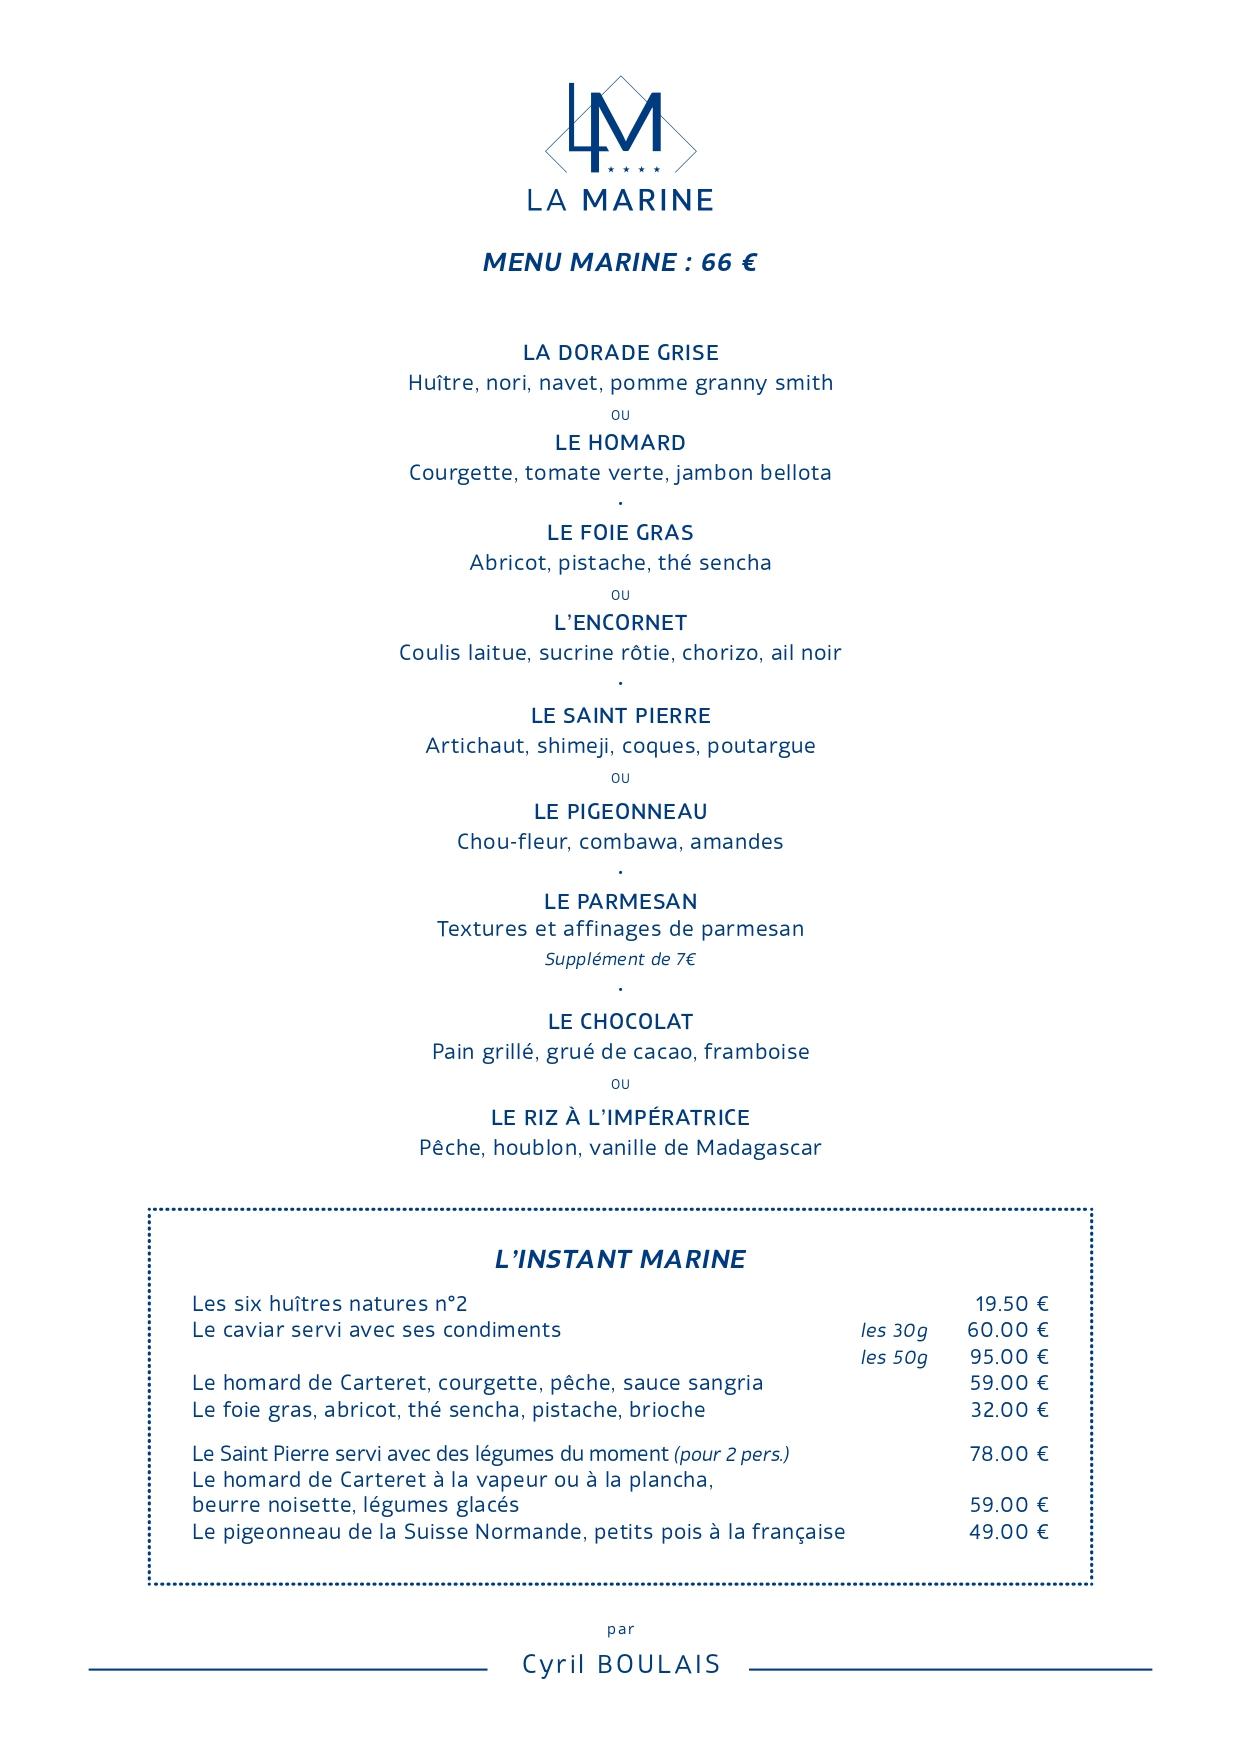 menusA4portraitLM-26Juillet2021 66